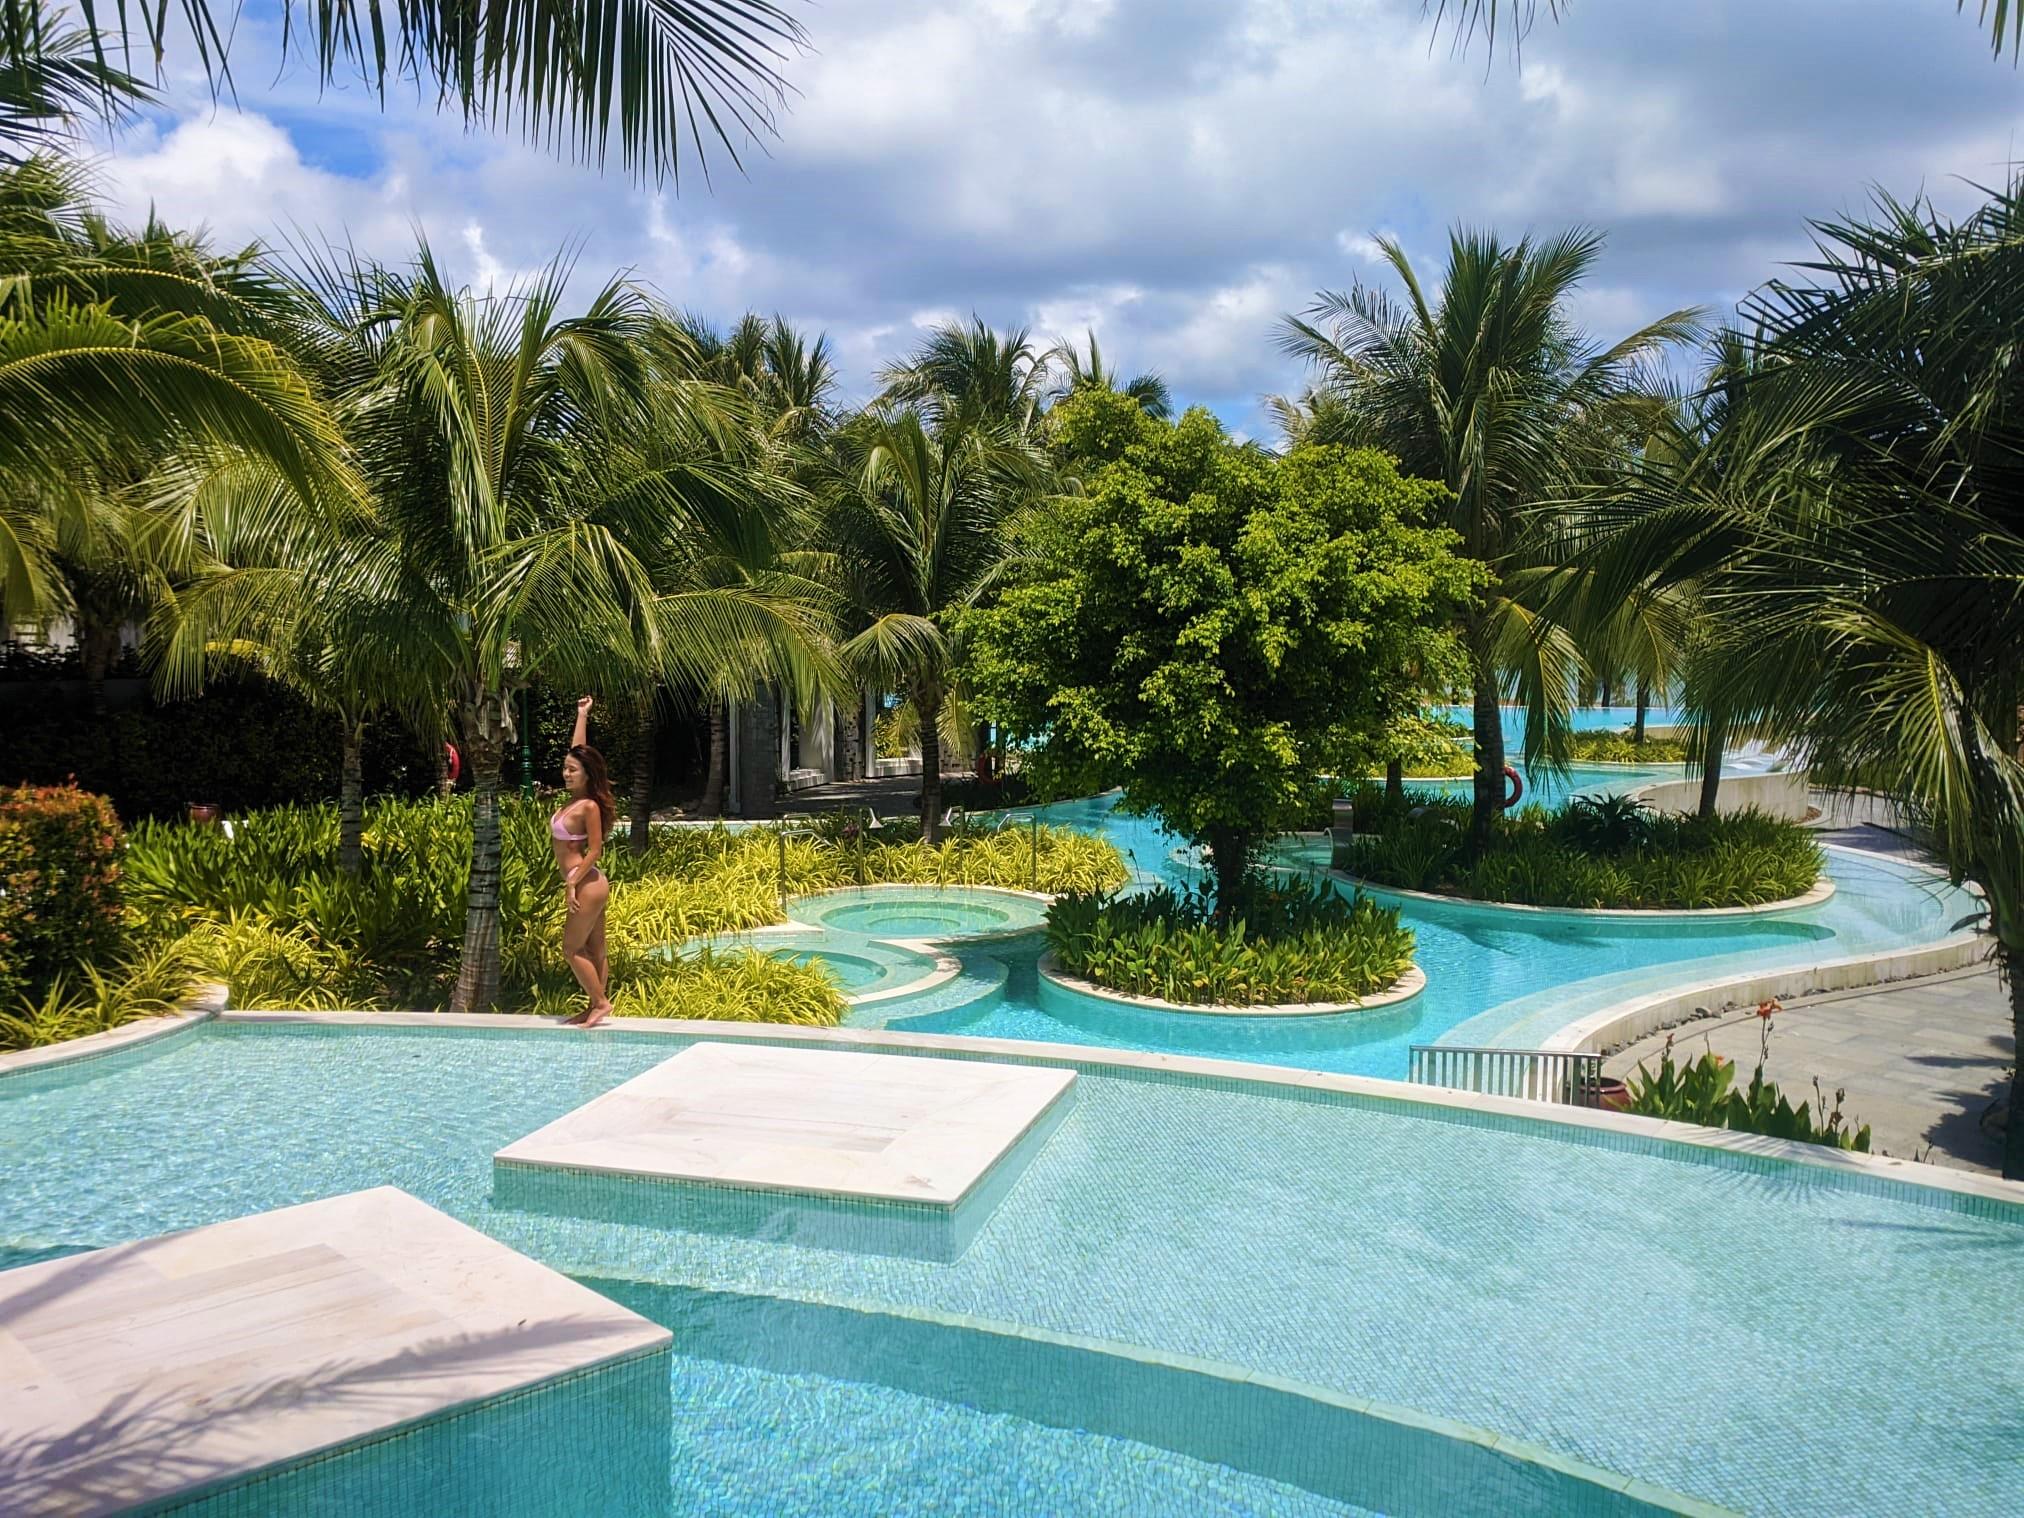 Swimming pool at Premier Village Resort, Phu Quoc Island, Vietnam